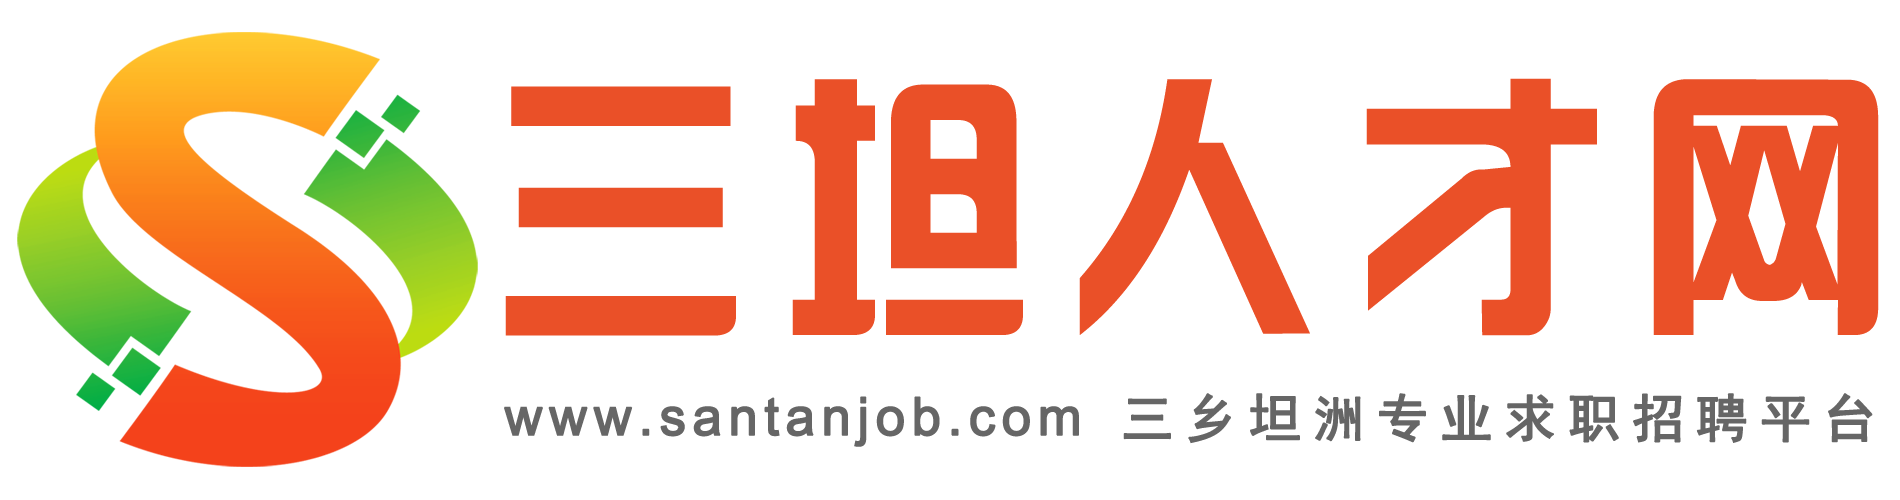 三坦人才网(SanTanJob.com)